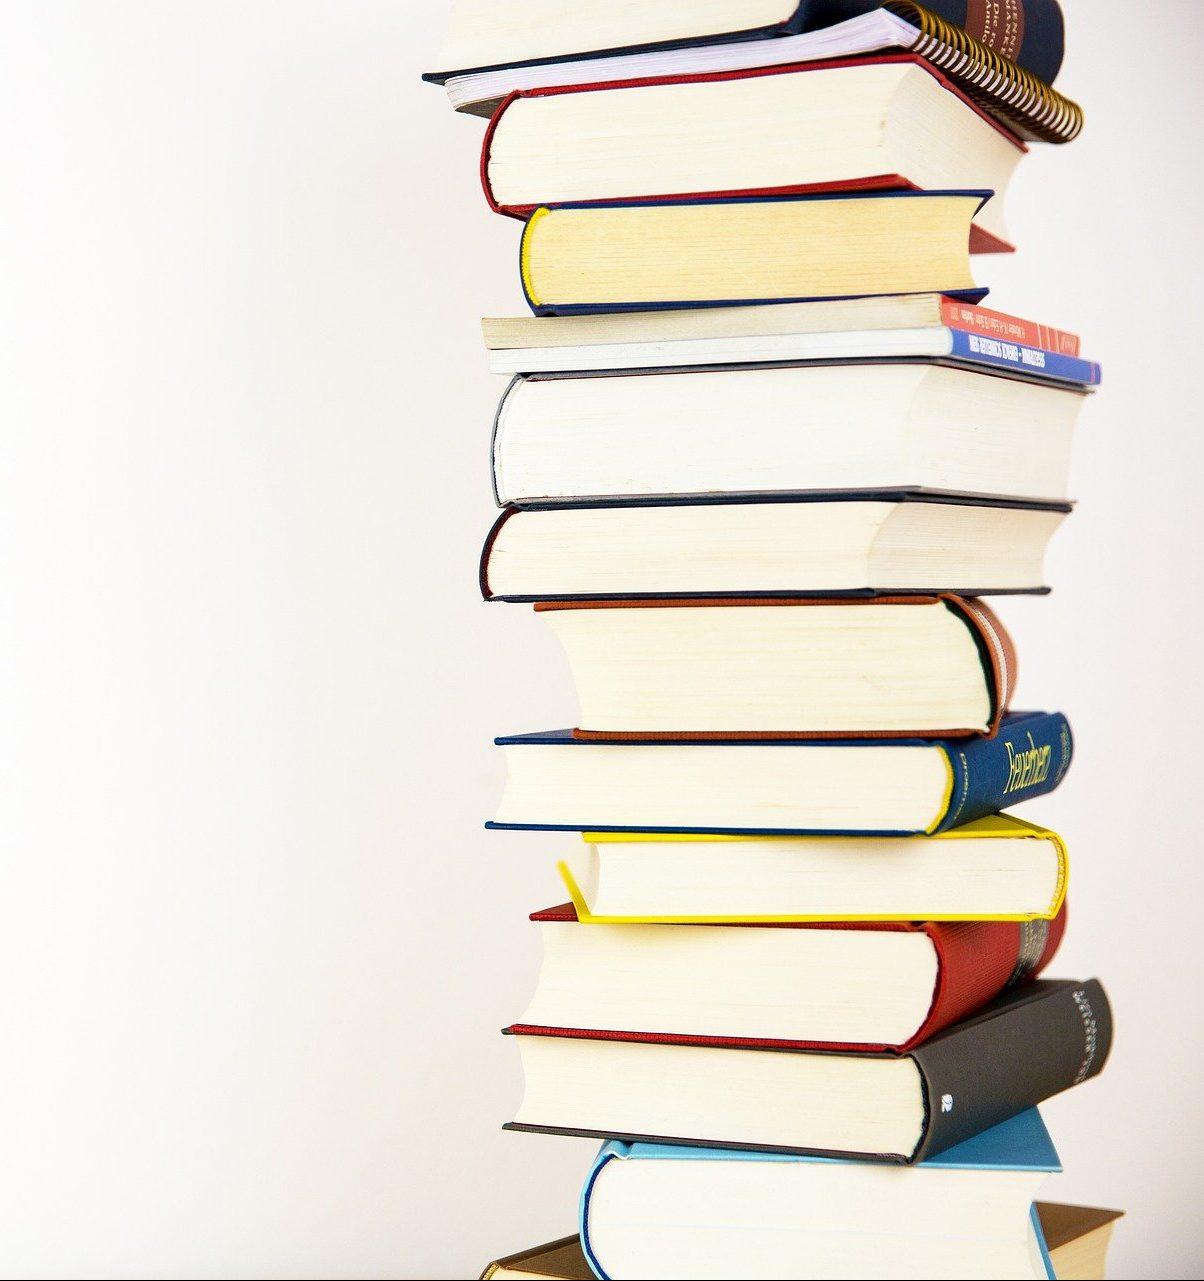 books-5937823_1920